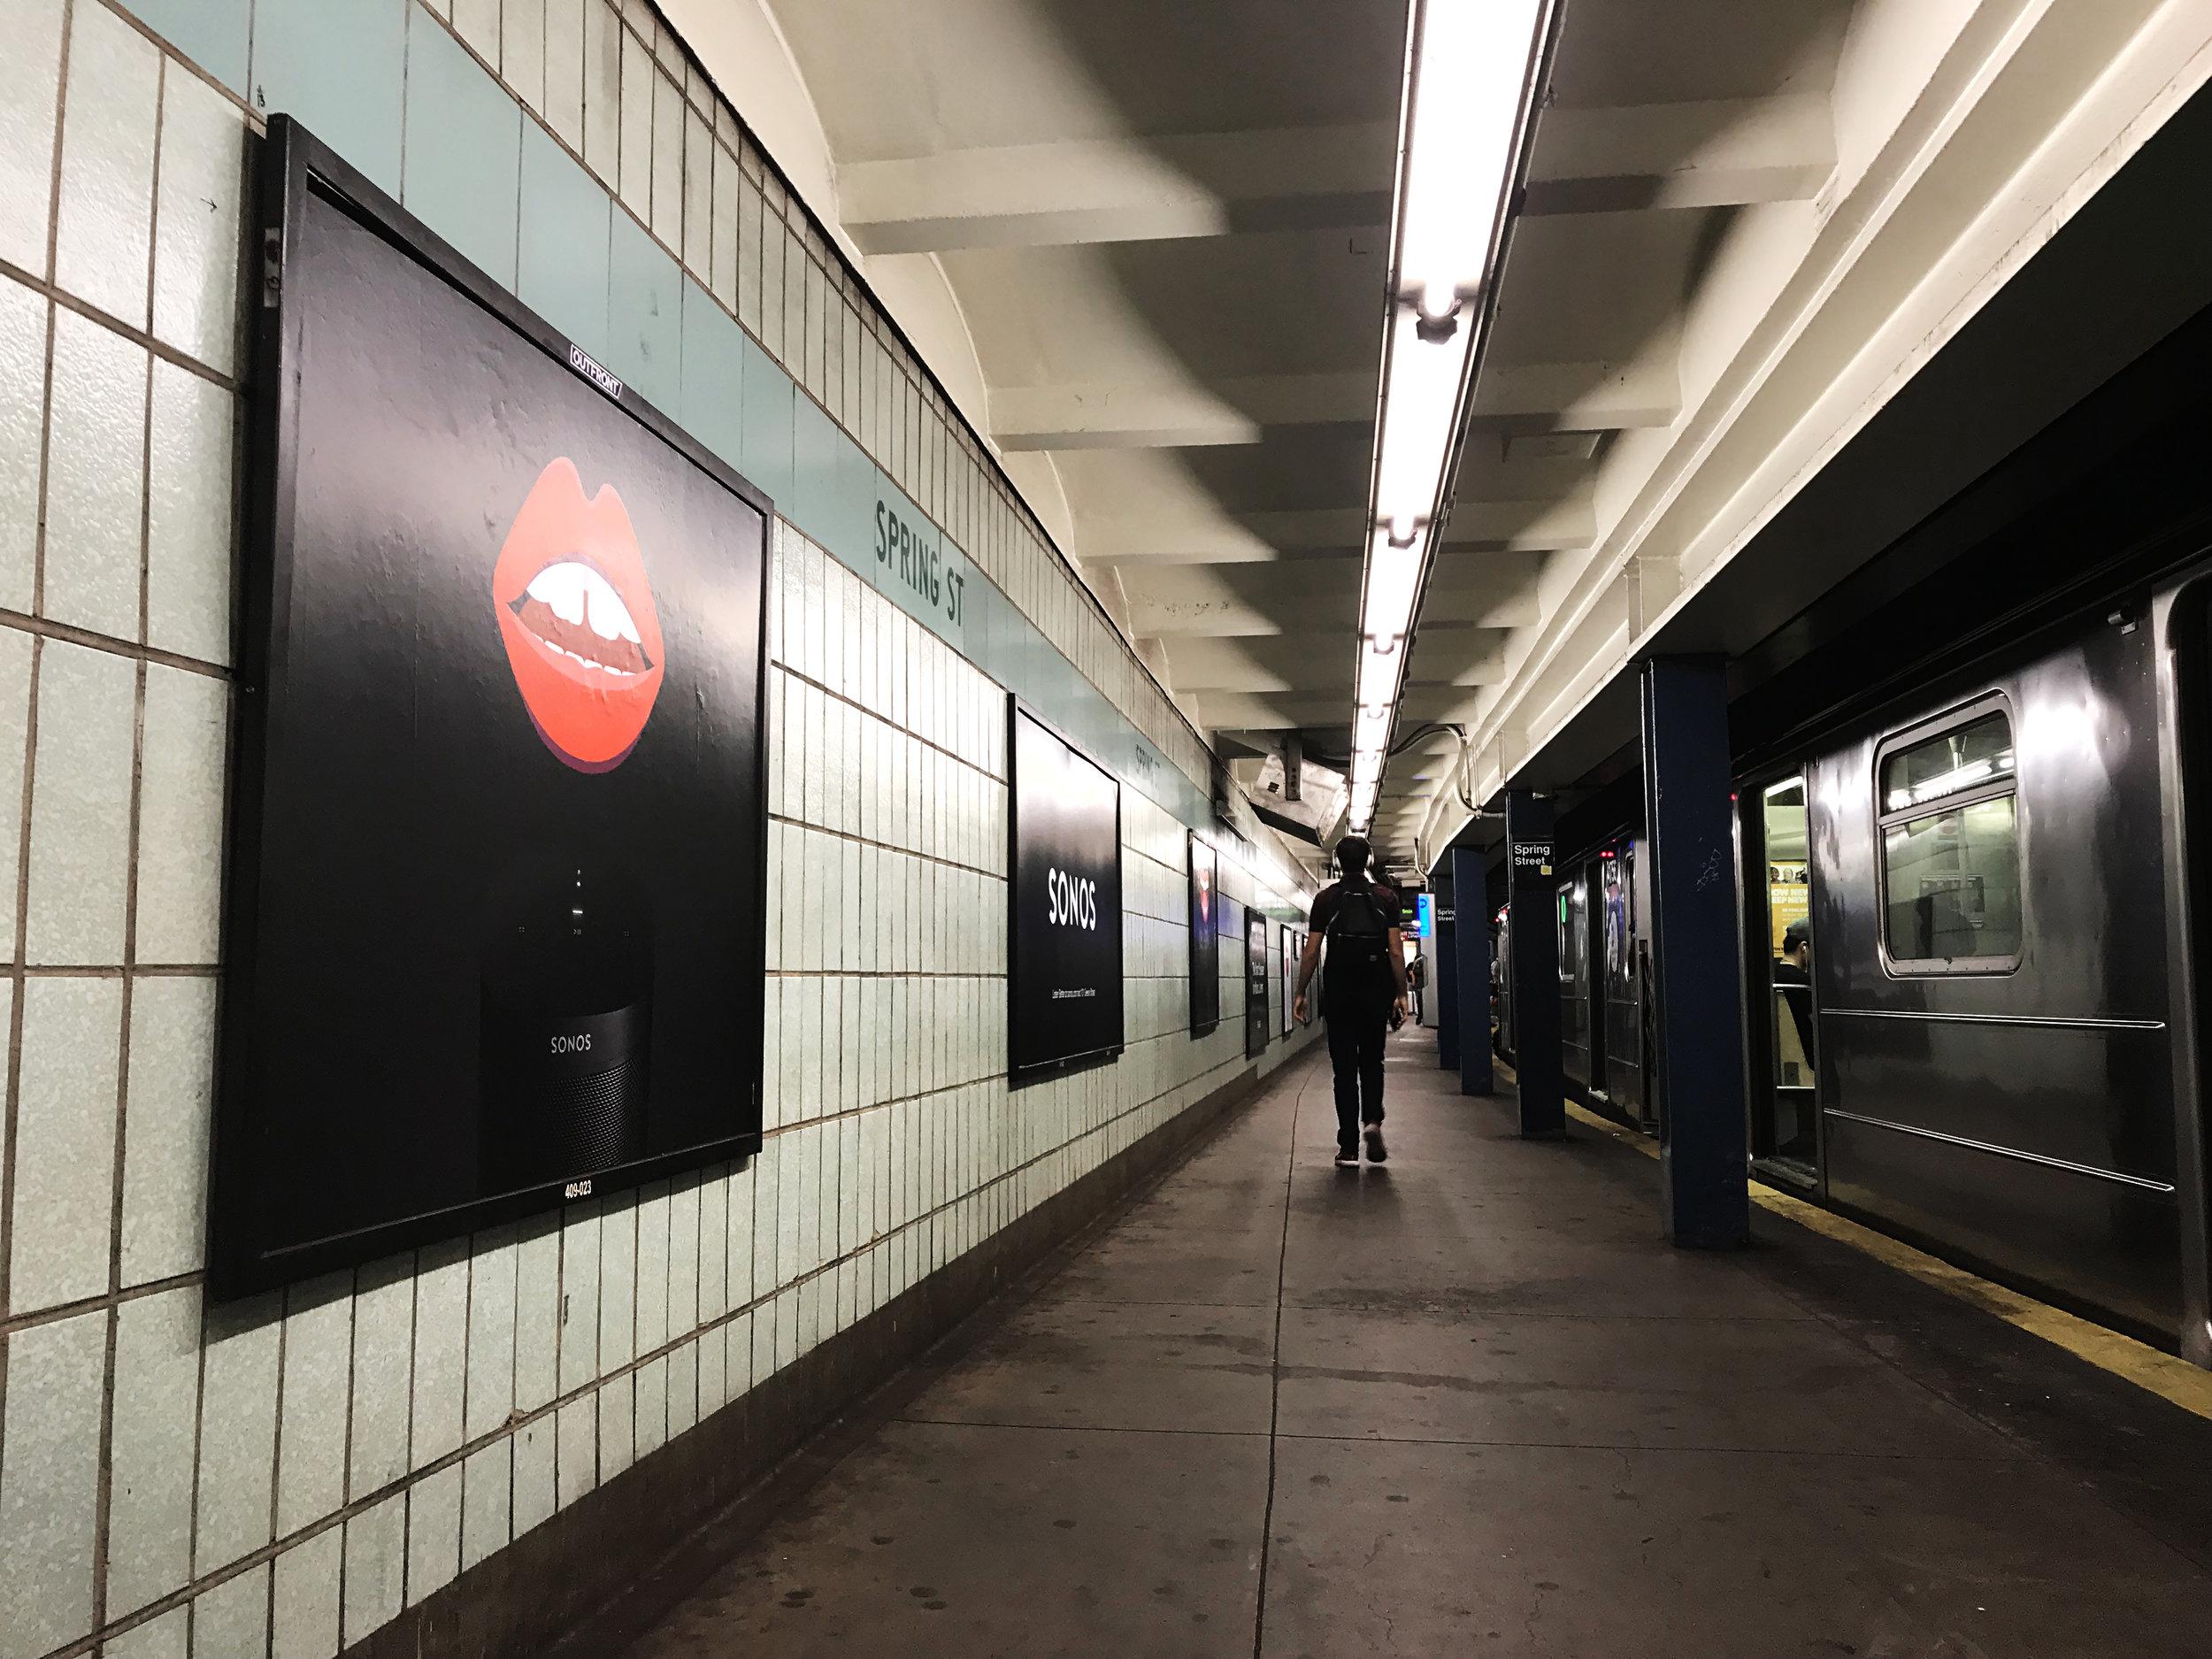 Sonos_station4.jpg